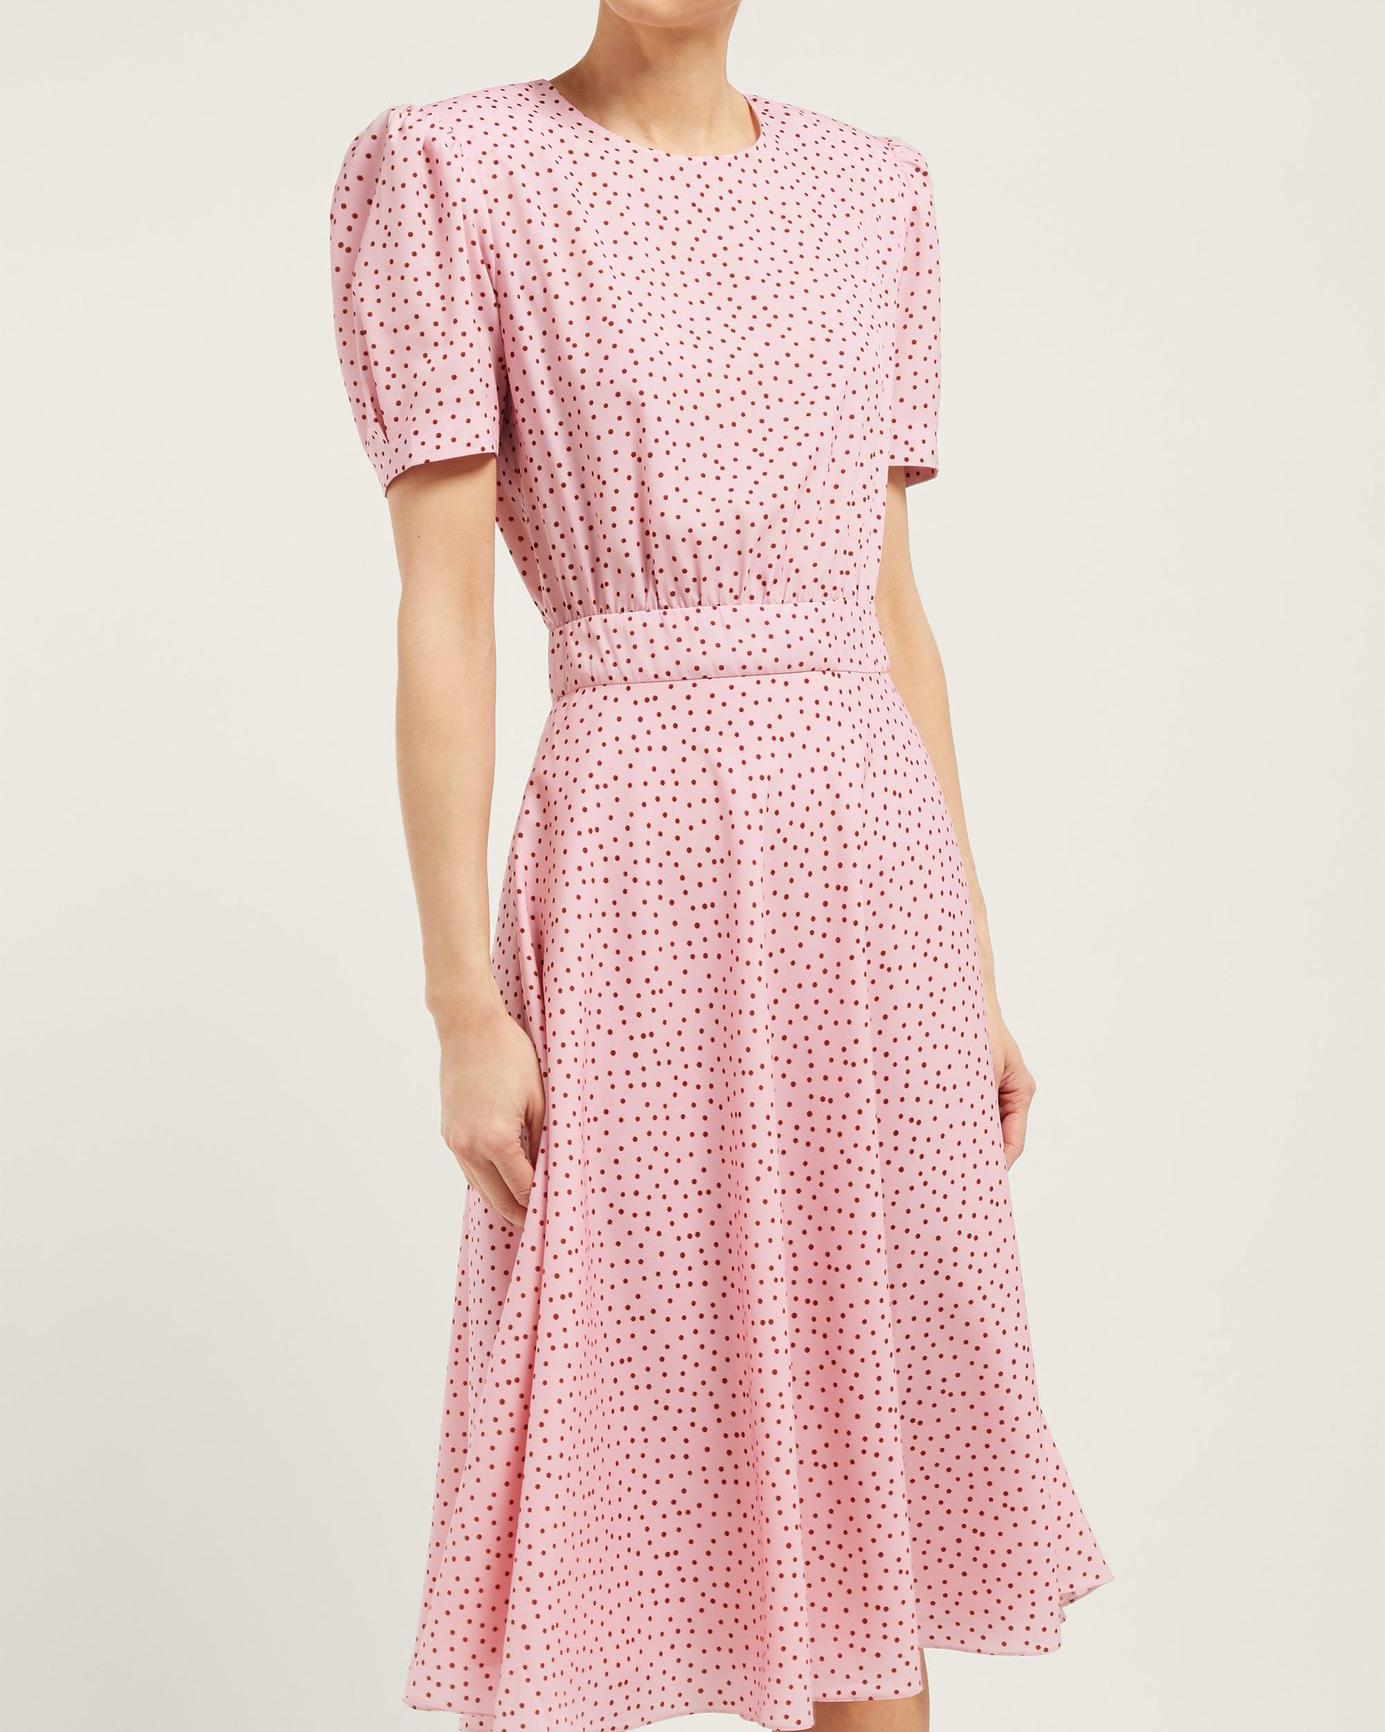 Vika Gazinskaya Polka Dot Print Crepe Midi Dress